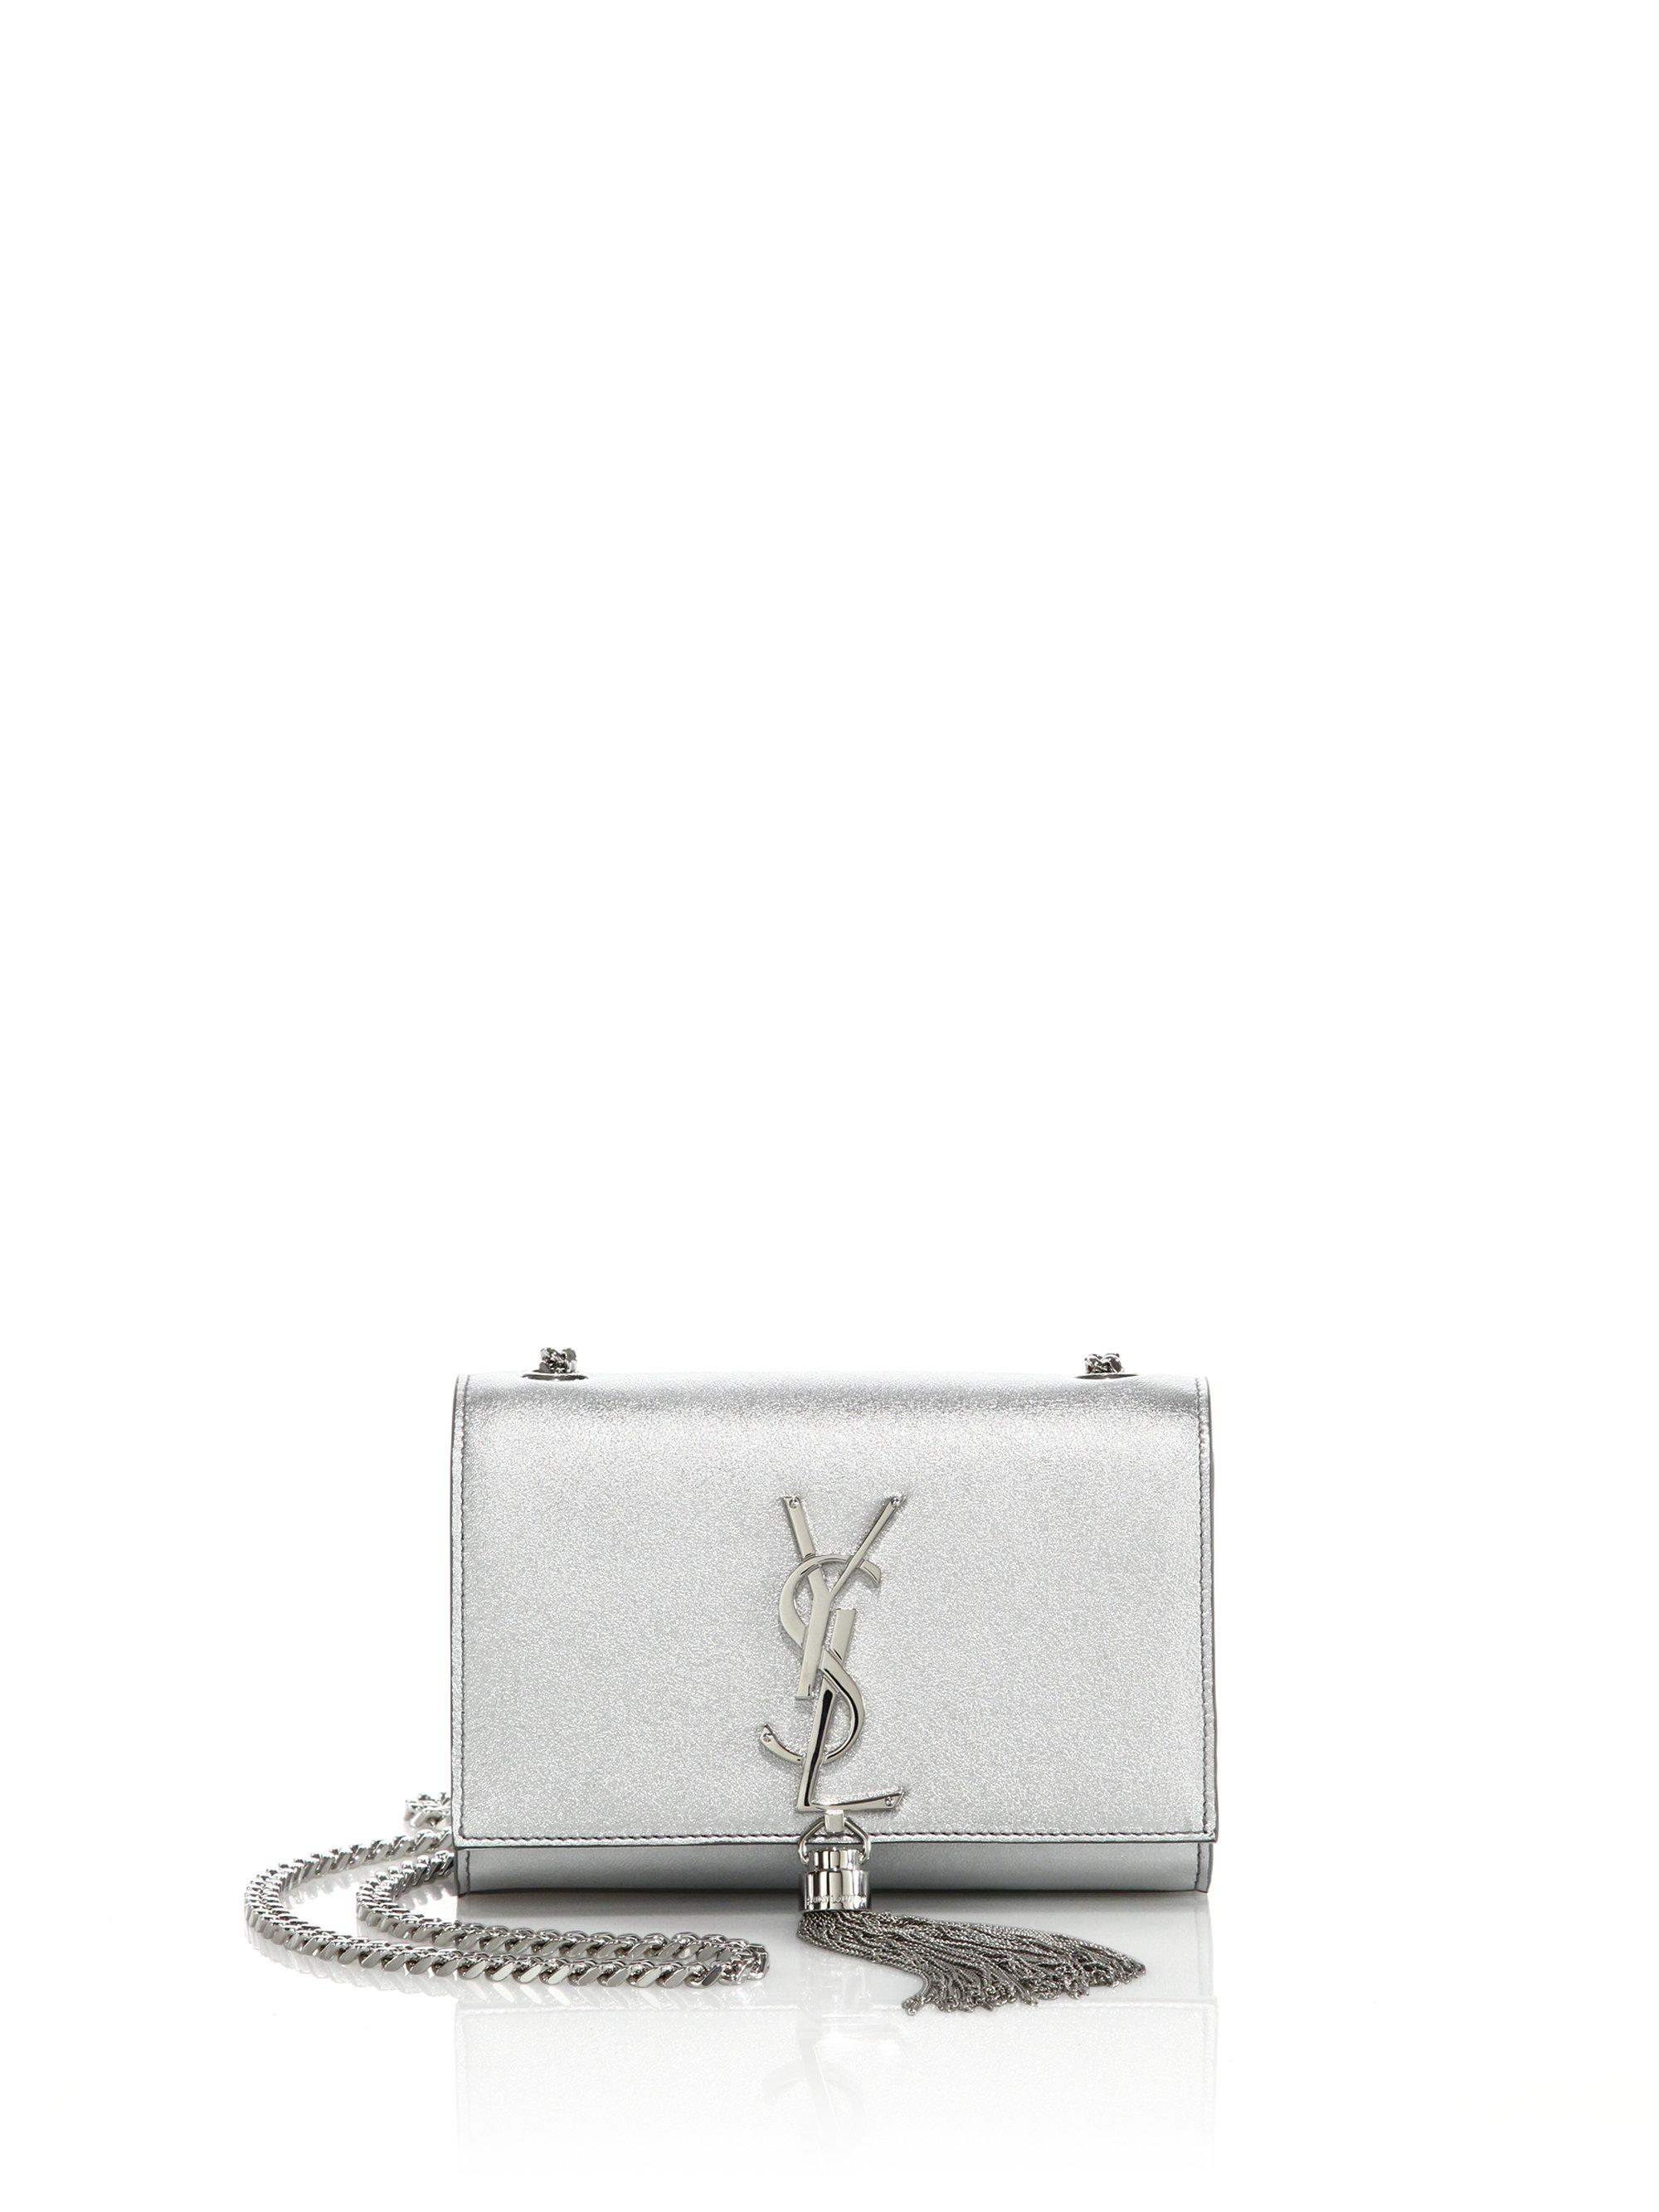 5a7733719d93 Lyst - Saint Laurent Monogram Small Metallic Leather Tassel ...